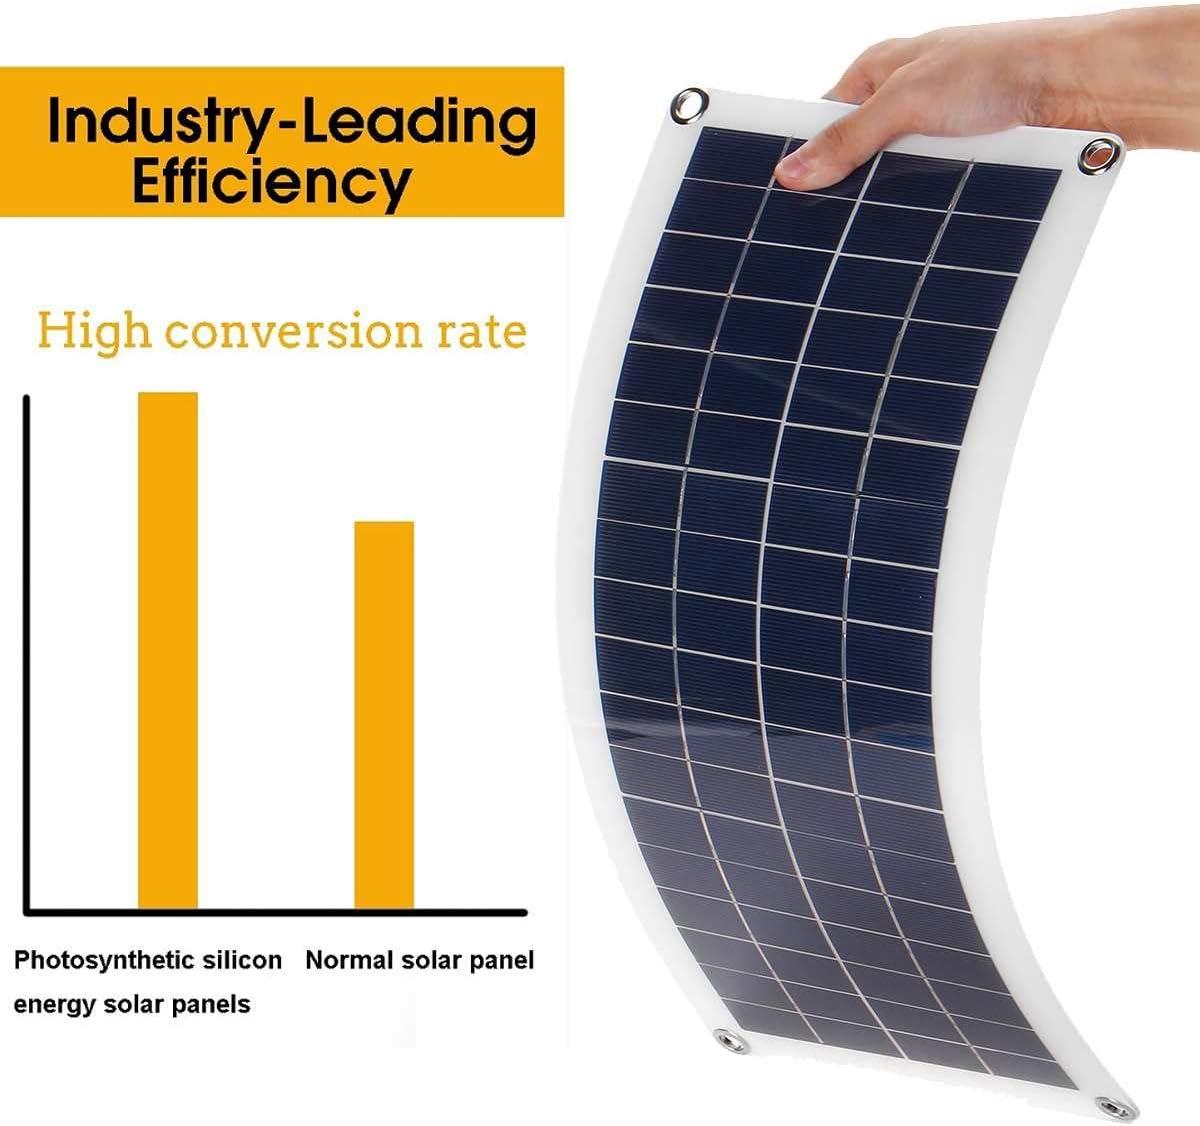 HMLIGHT 50W Flexible Solar Panel 10-30A 12V 24V-Controller Kfz-Ladeger/ät f/ür RV-Auto-Boots-LCD-Display PWM Solar Panel Laderegler,10AController